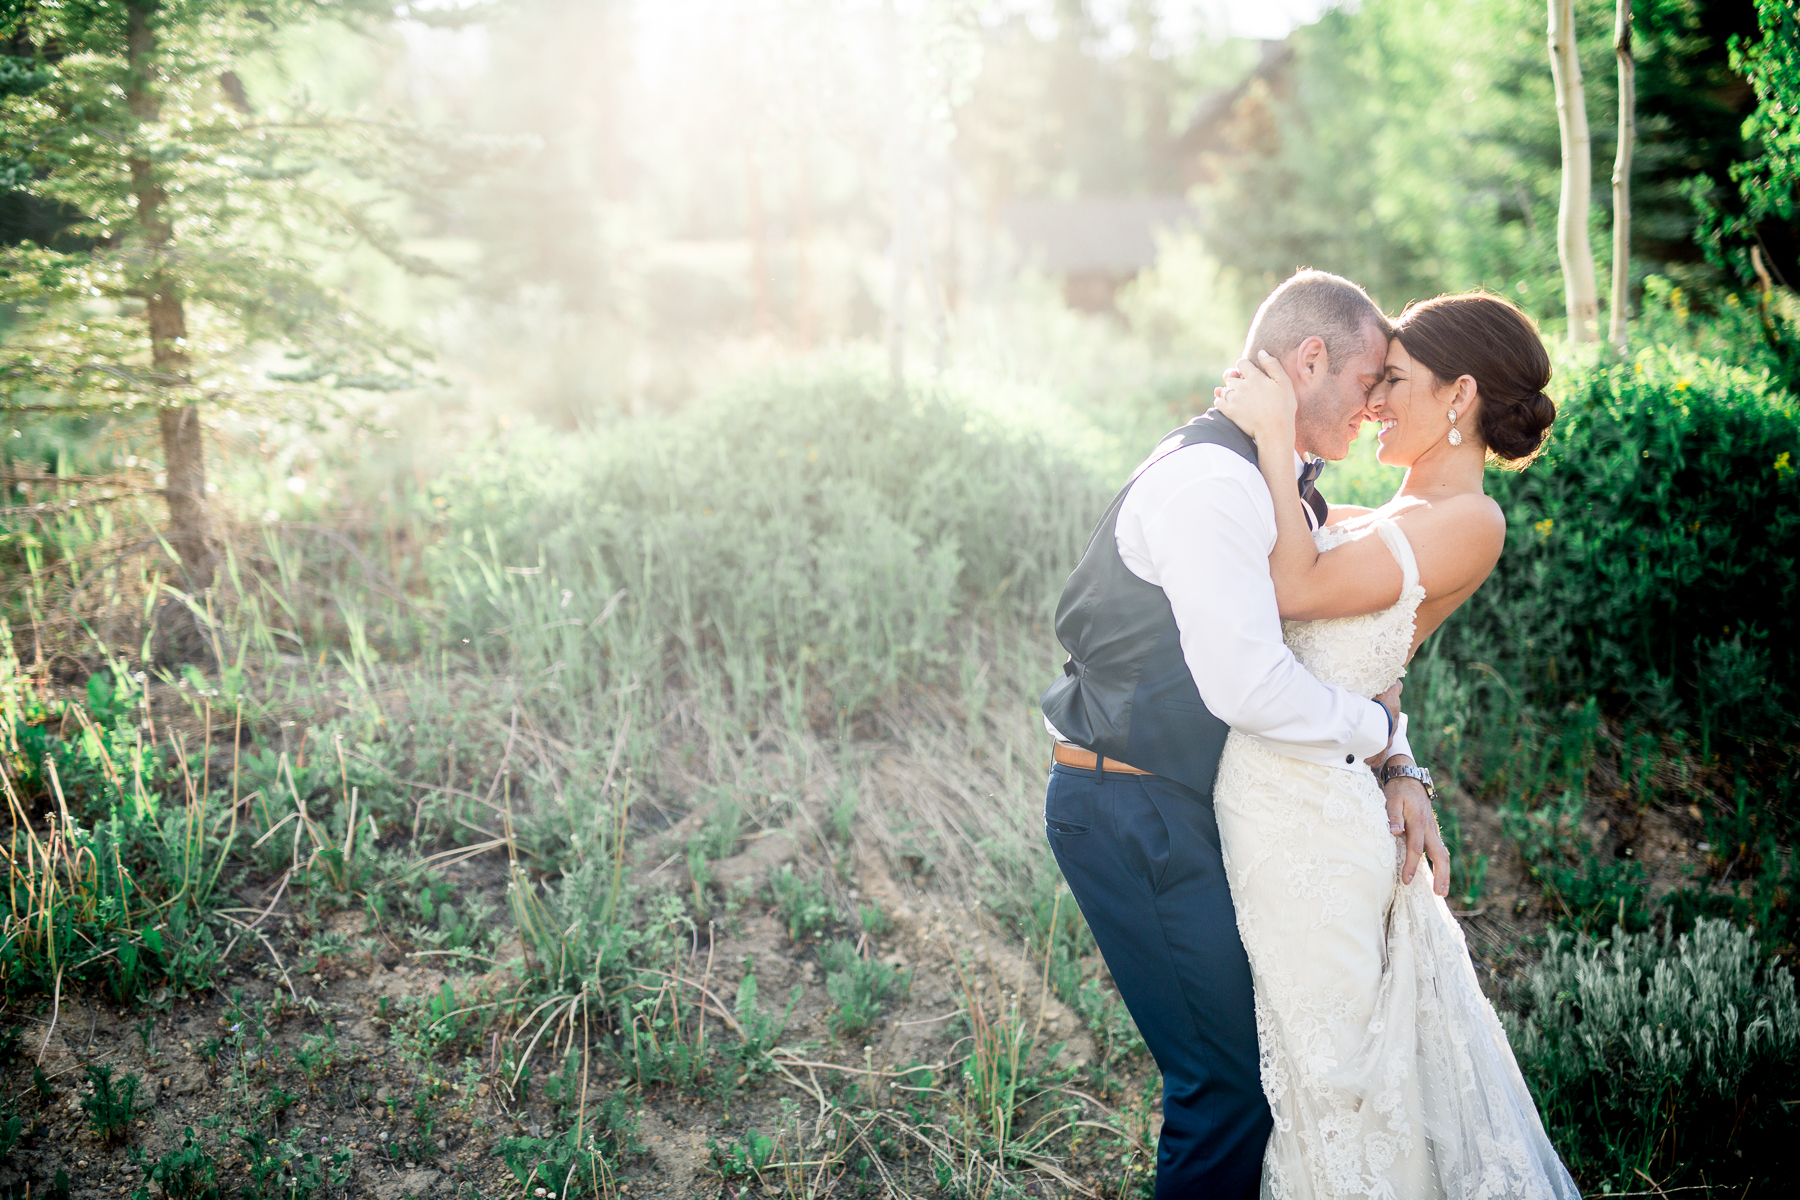 StaciDesign-Colorado-Wedding-5508.jpg